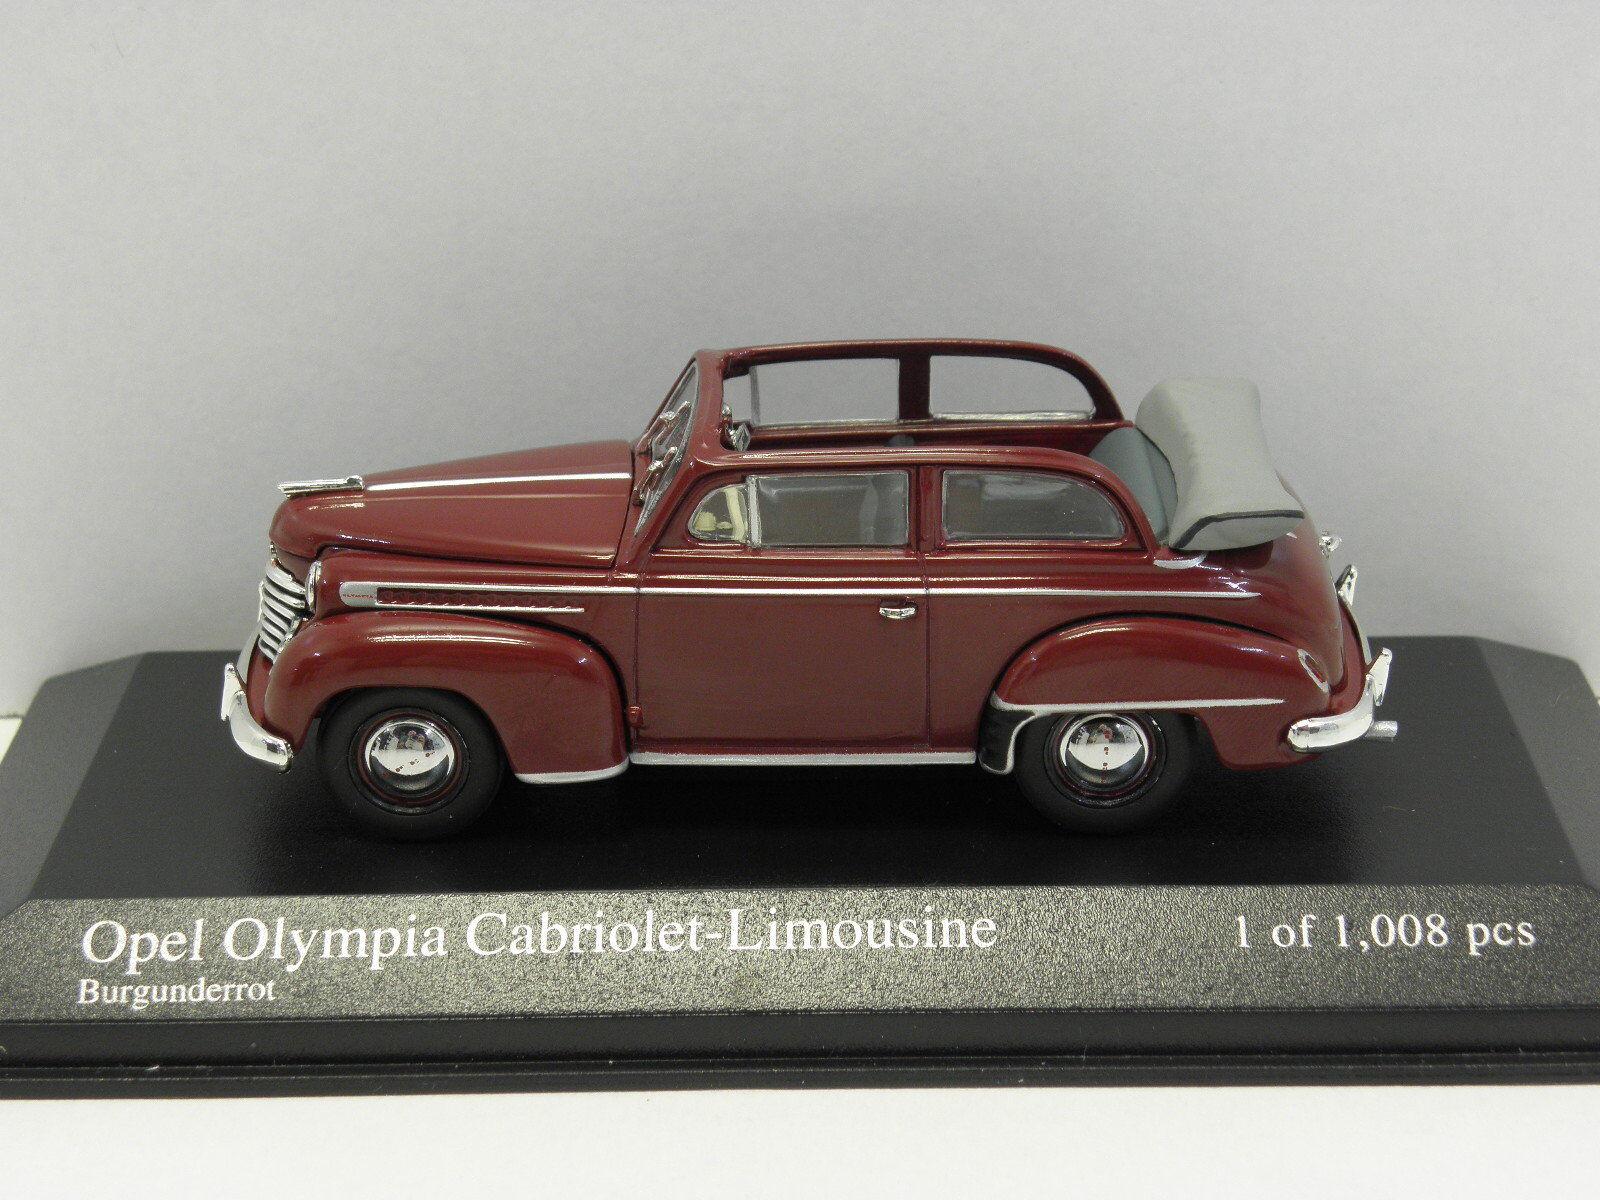 Minichamps 430040432 sammelmodell Opel Olympia Capriolet 1951 échelle 1 43